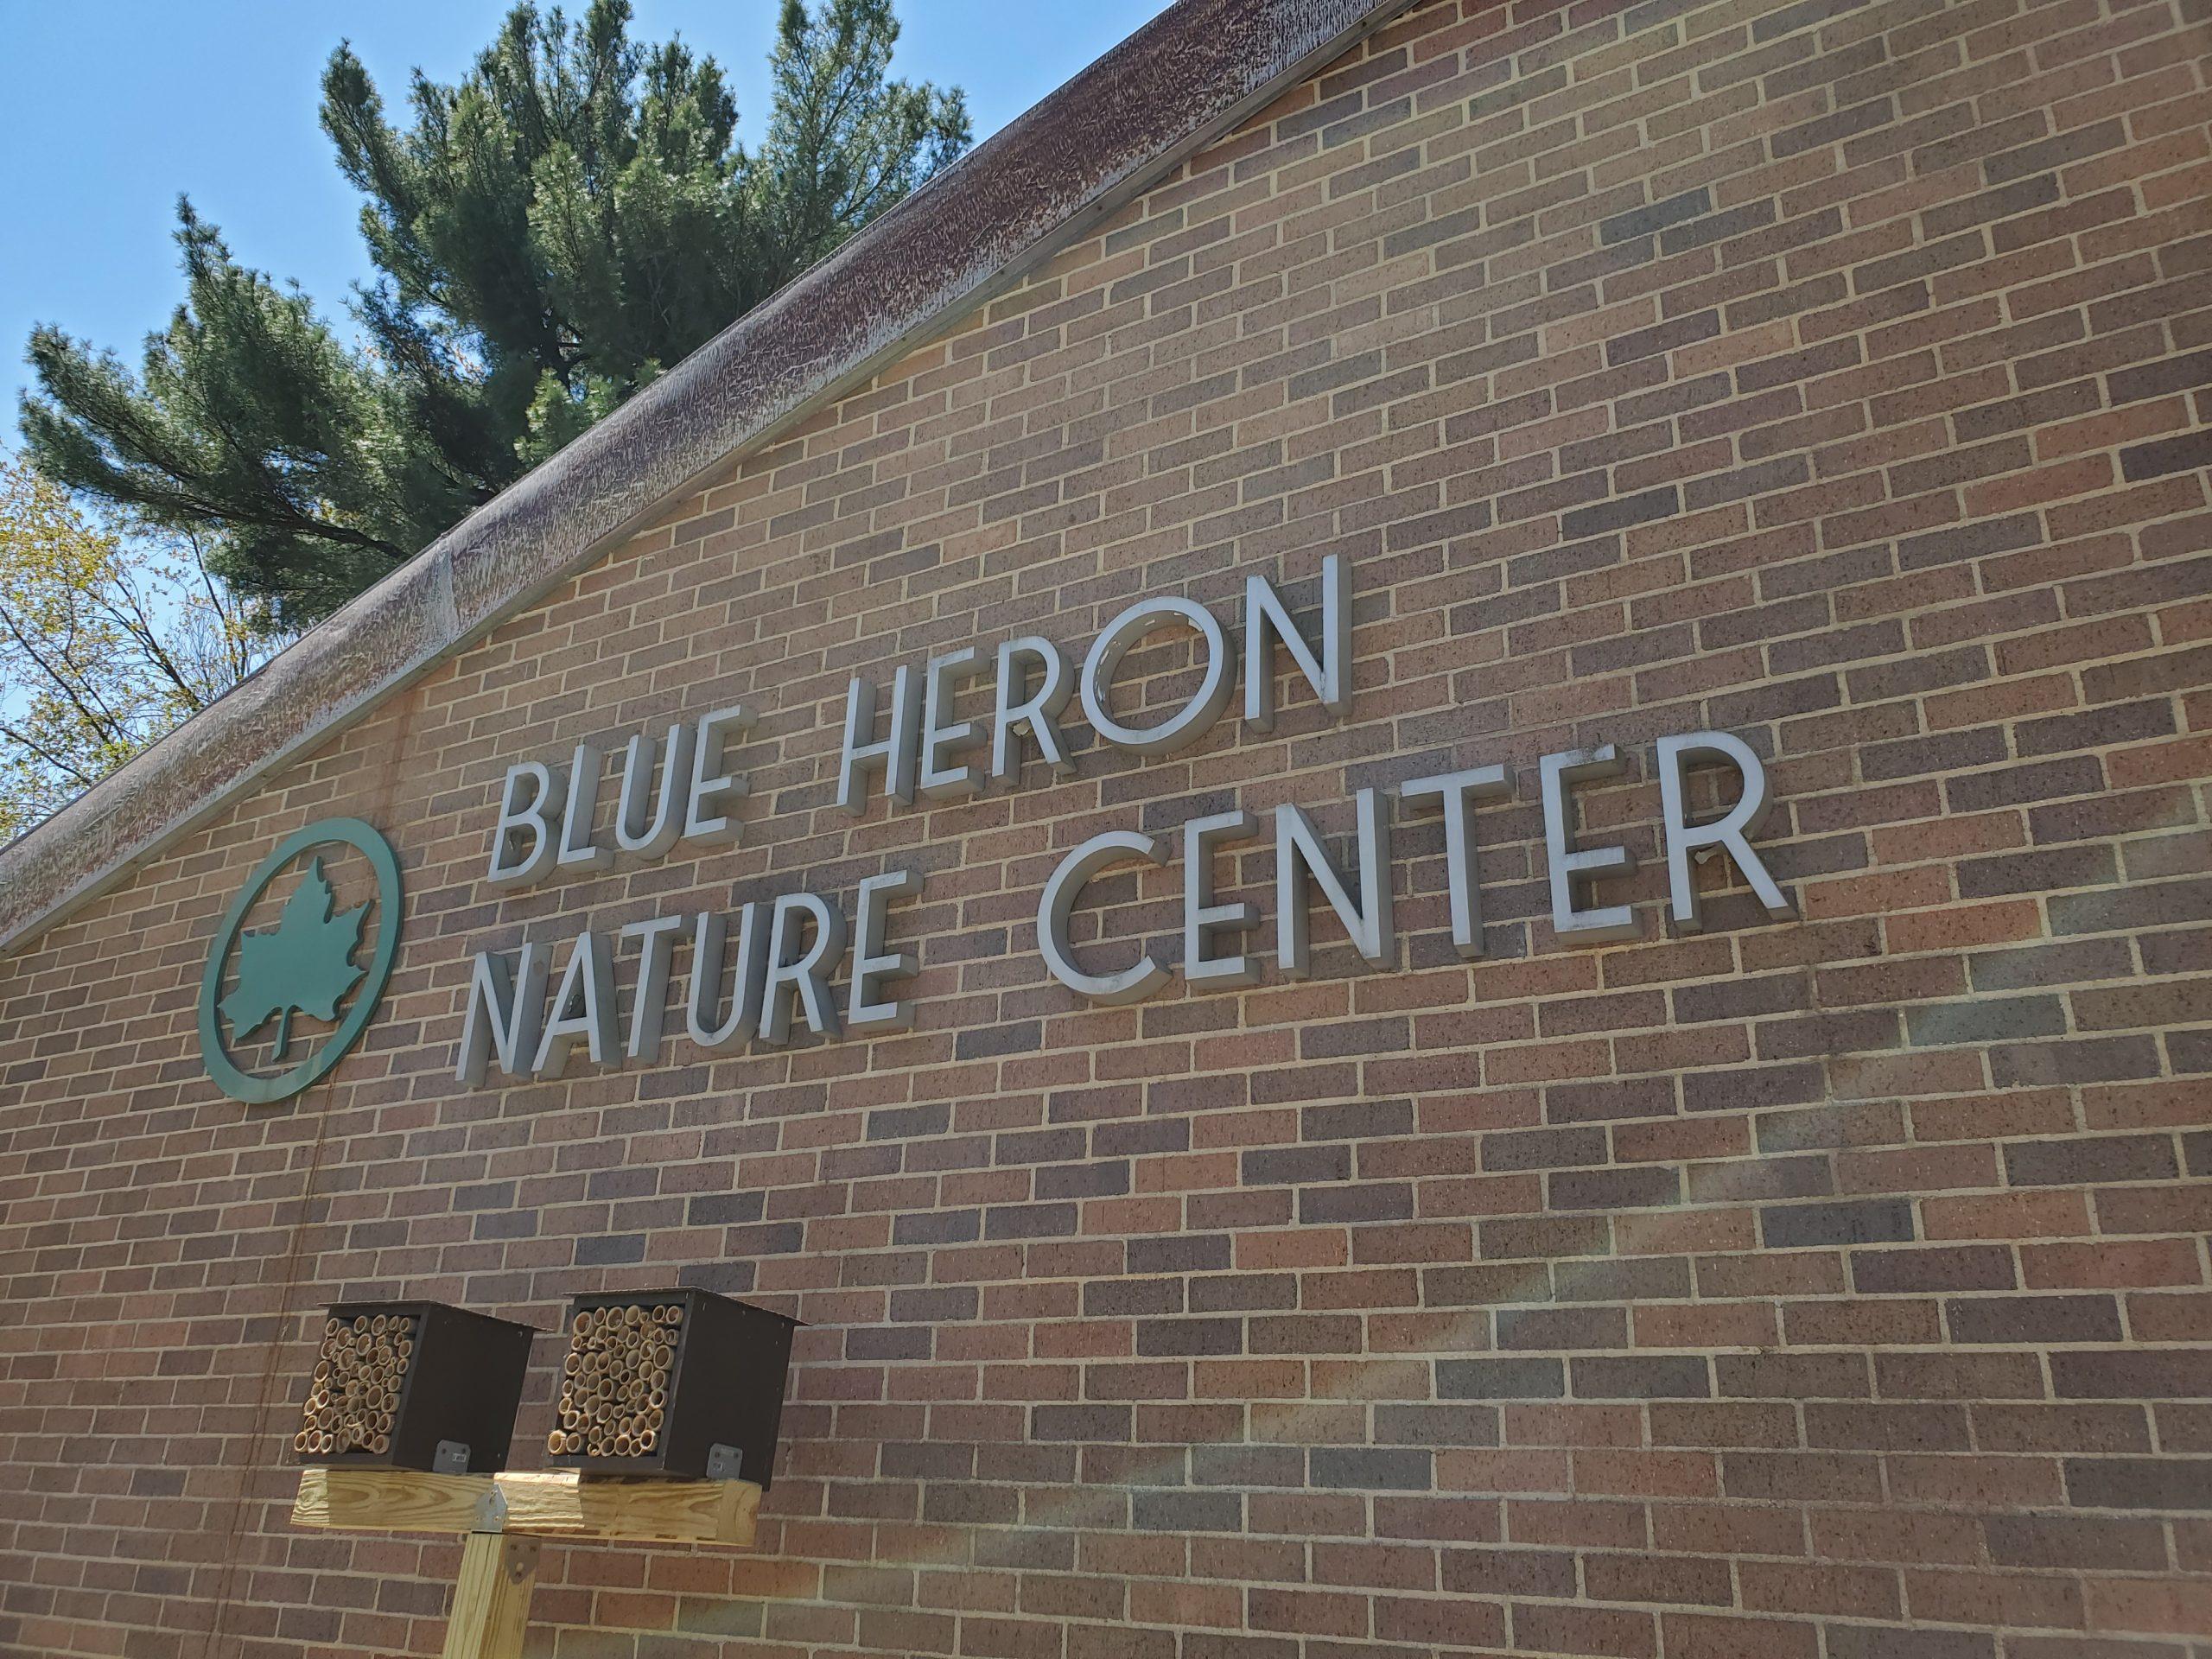 Blue Heron Park Visitor Center, April 20, 2020. Patricia M. Salmon